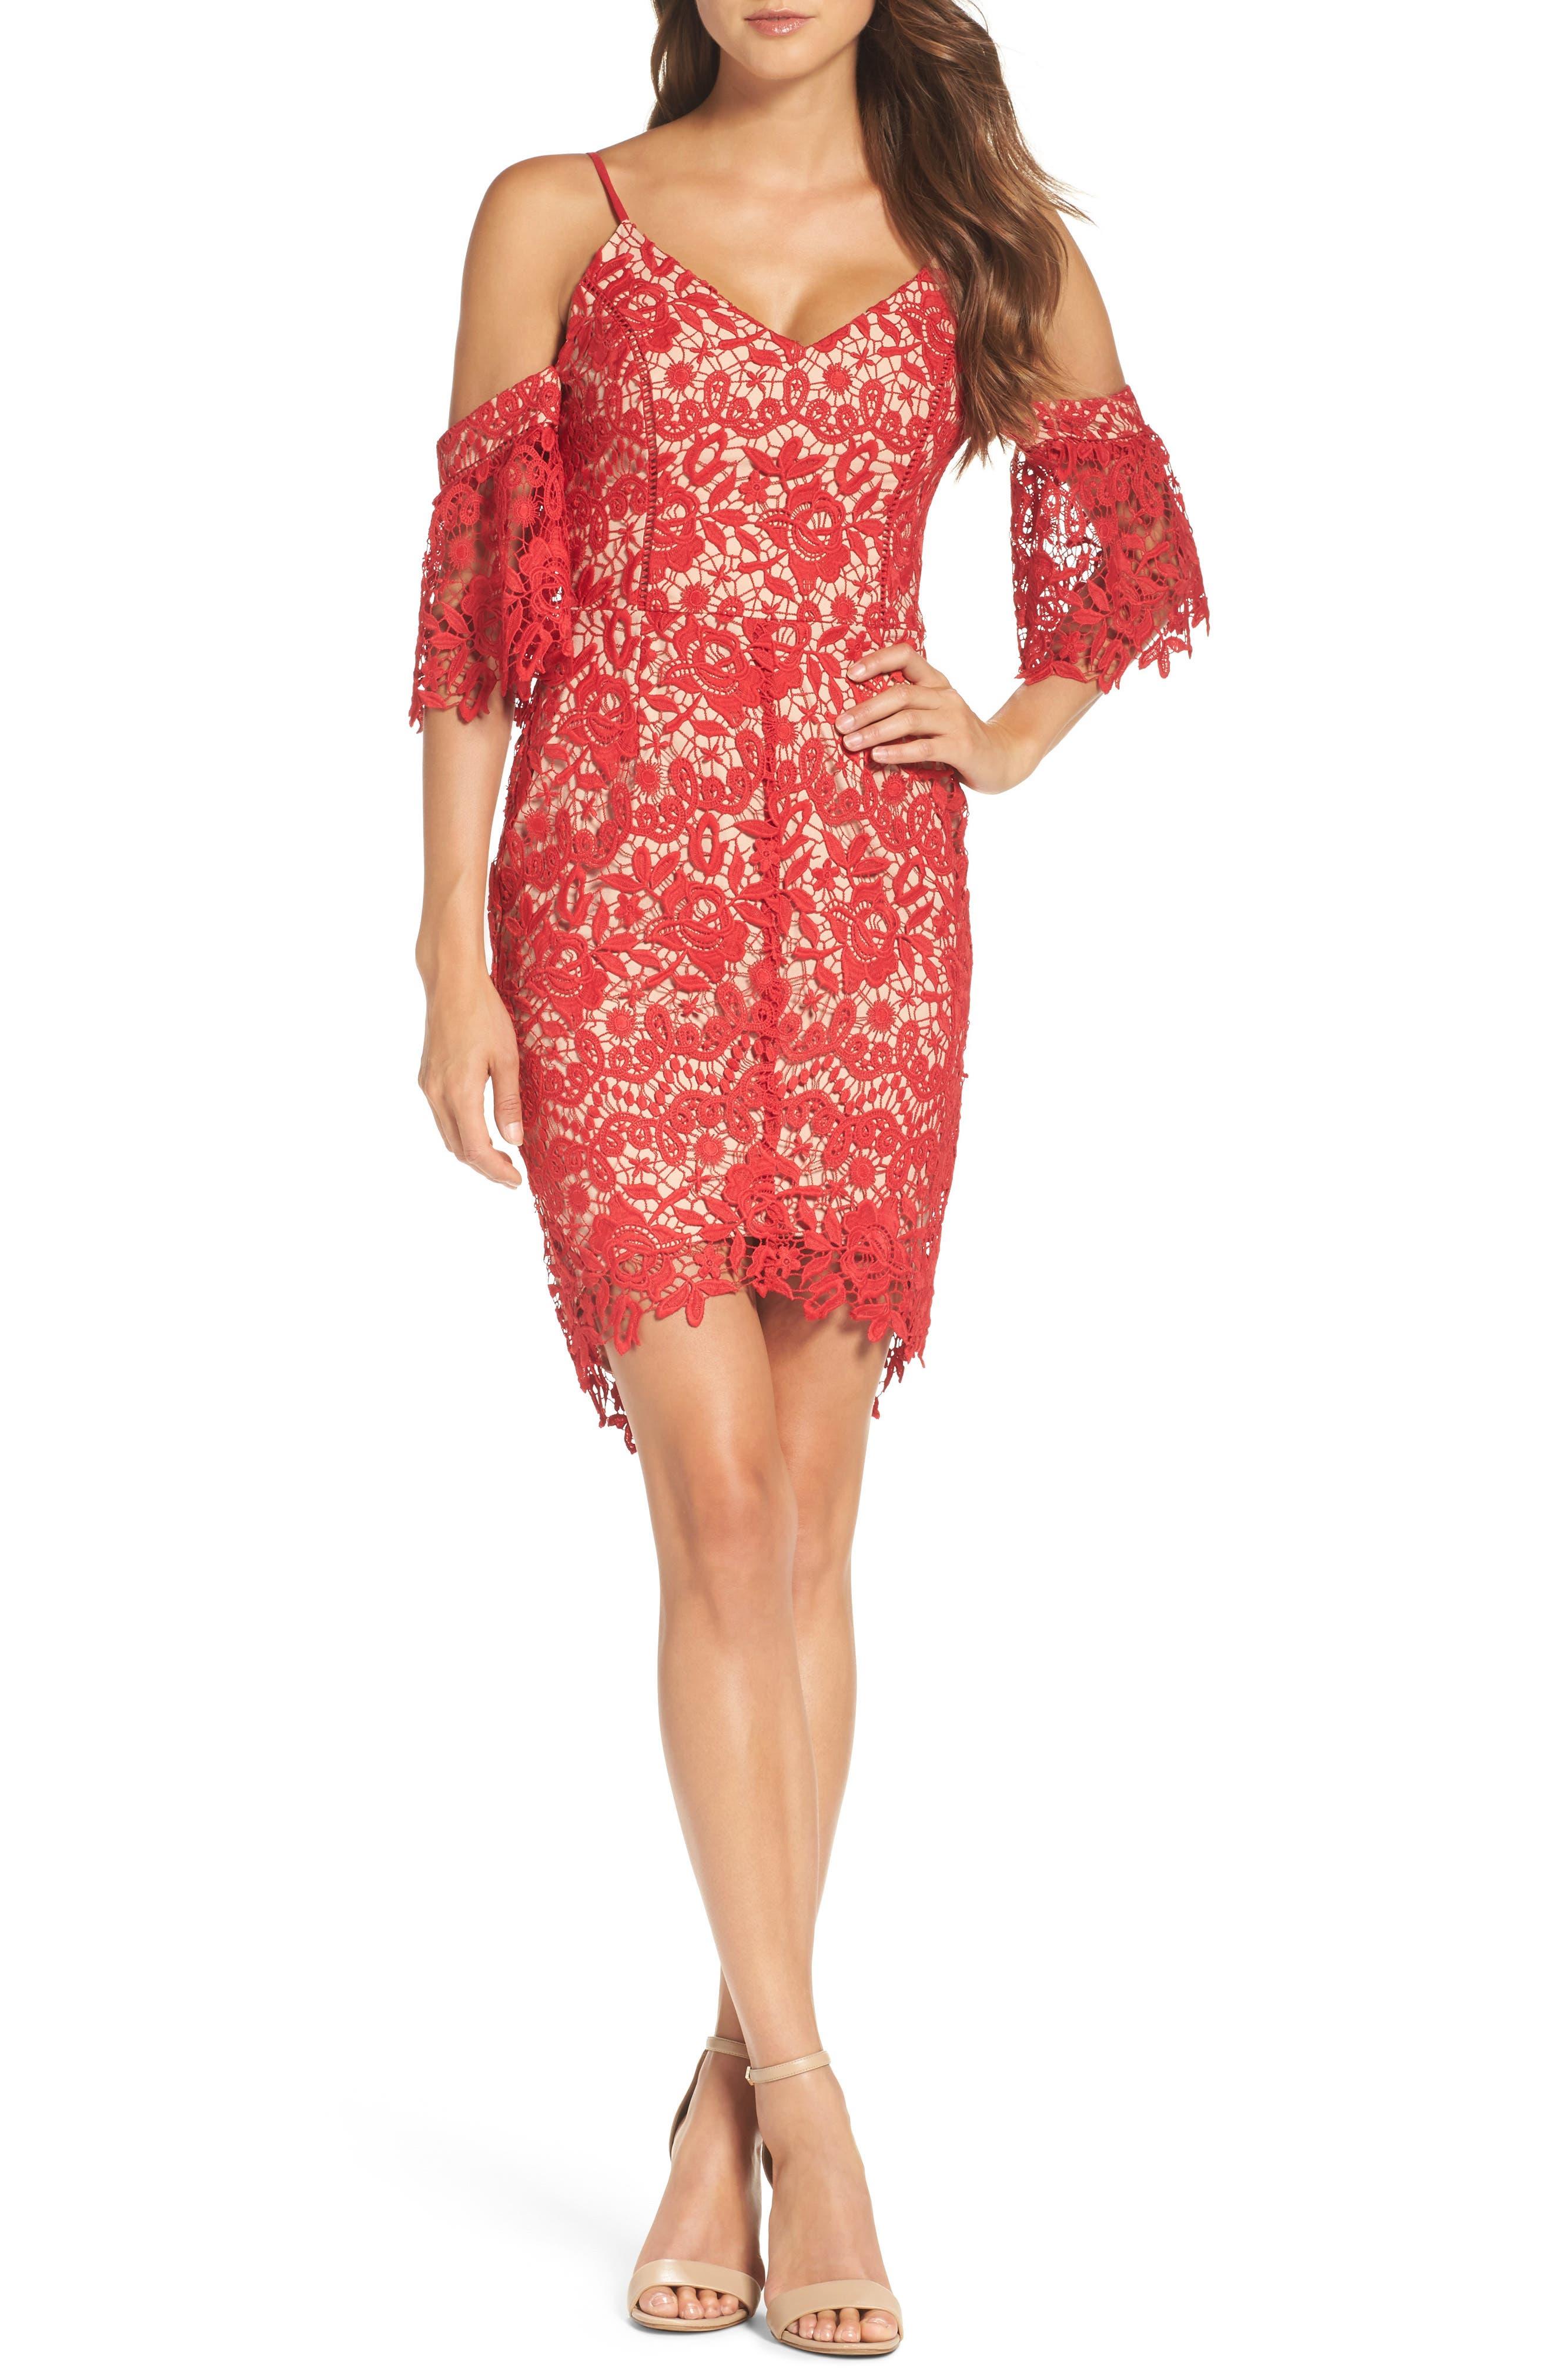 Alternate Image 1 Selected - Adelyn Rae Krista Cold Shoulder Lace Sheath Dress